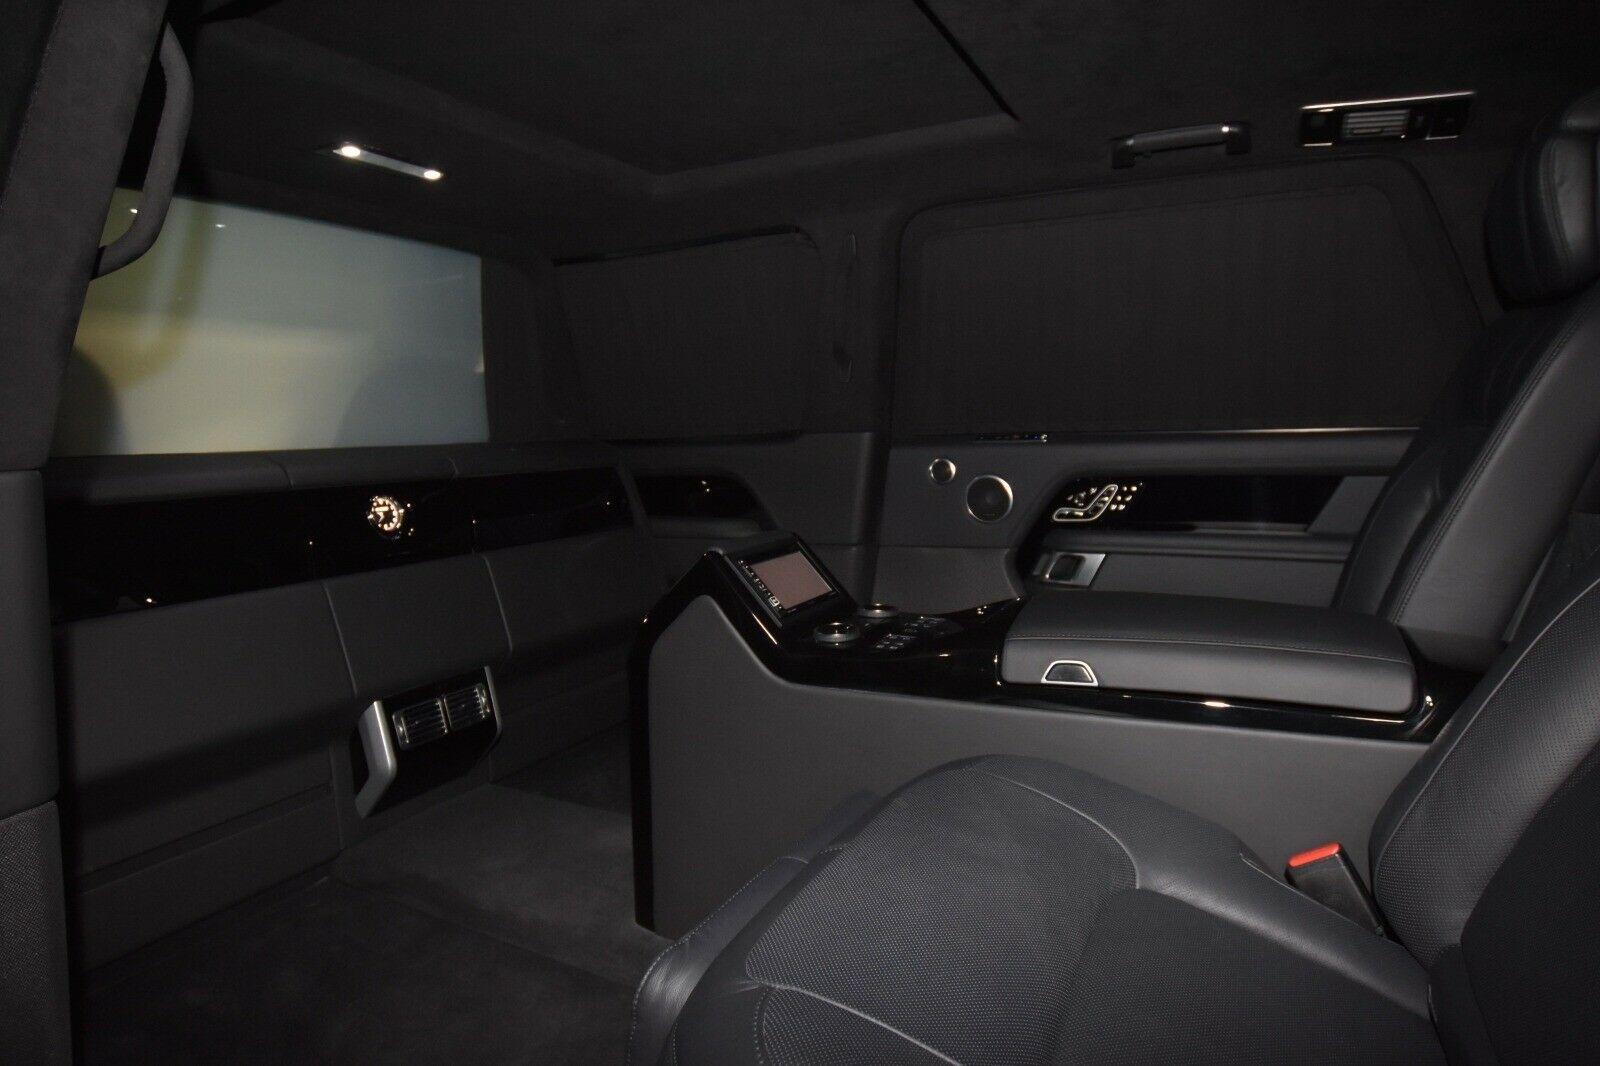 Range-Rover-SVAutobiography-by-Klassen-26